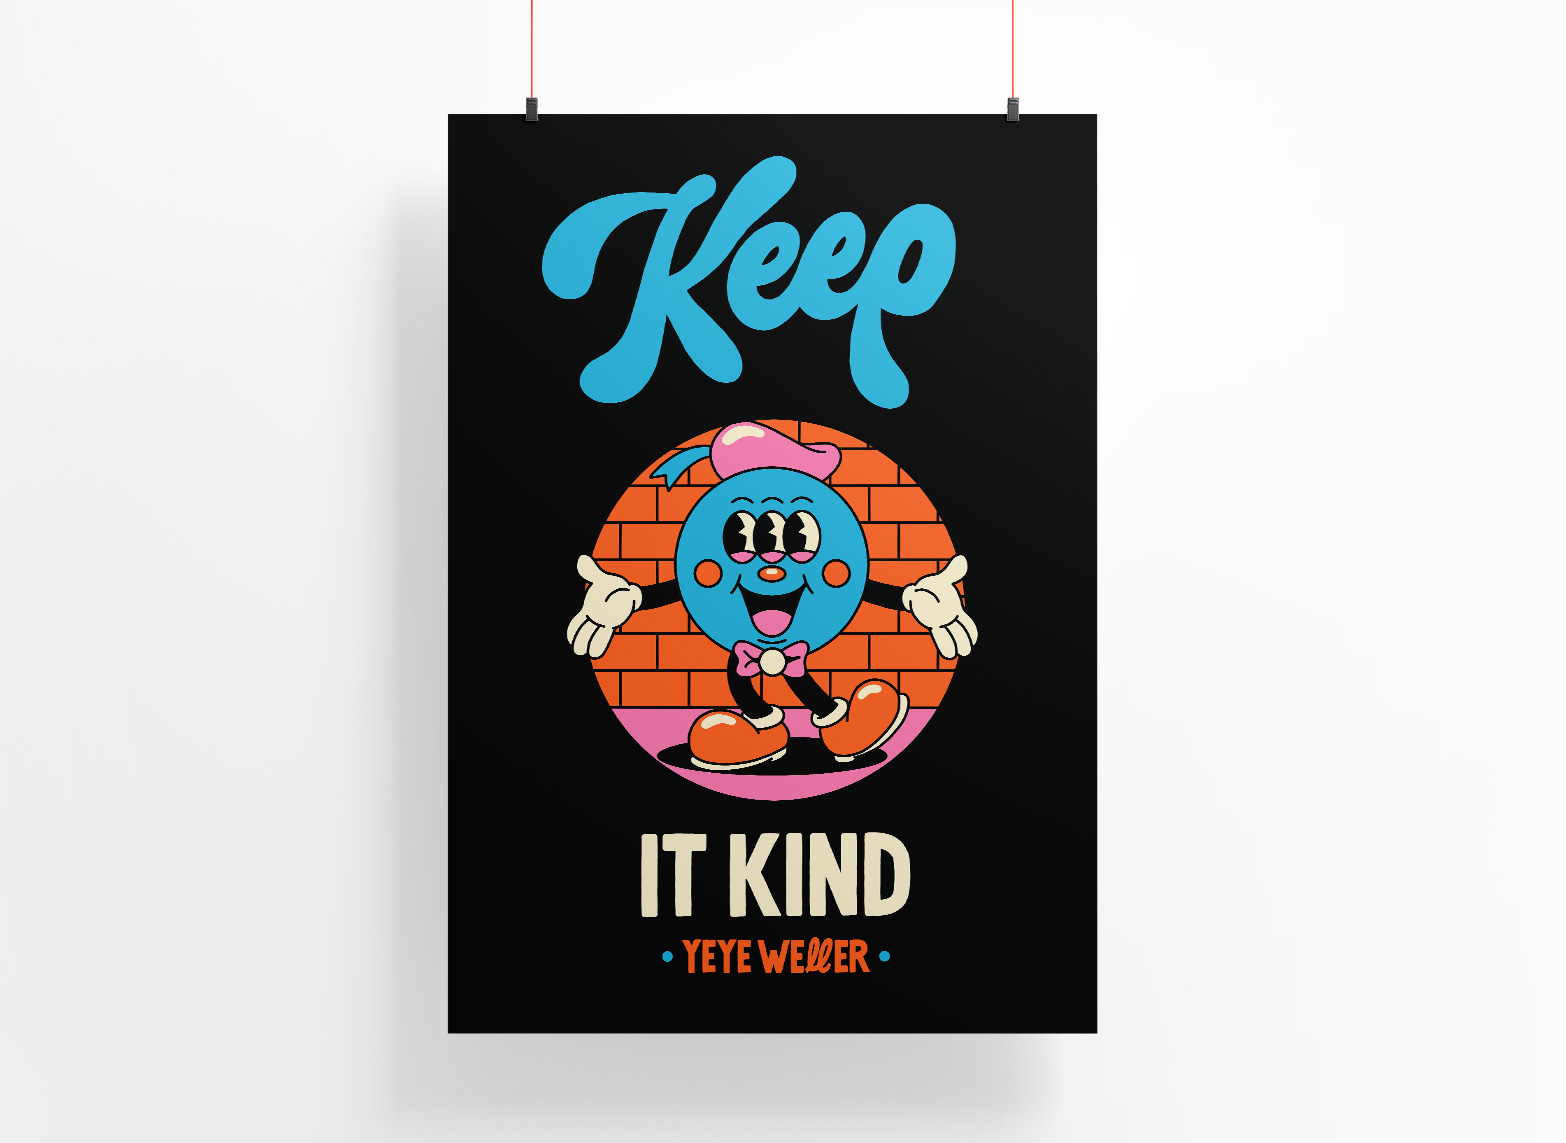 KIND - LIMITED EDITION PRINT